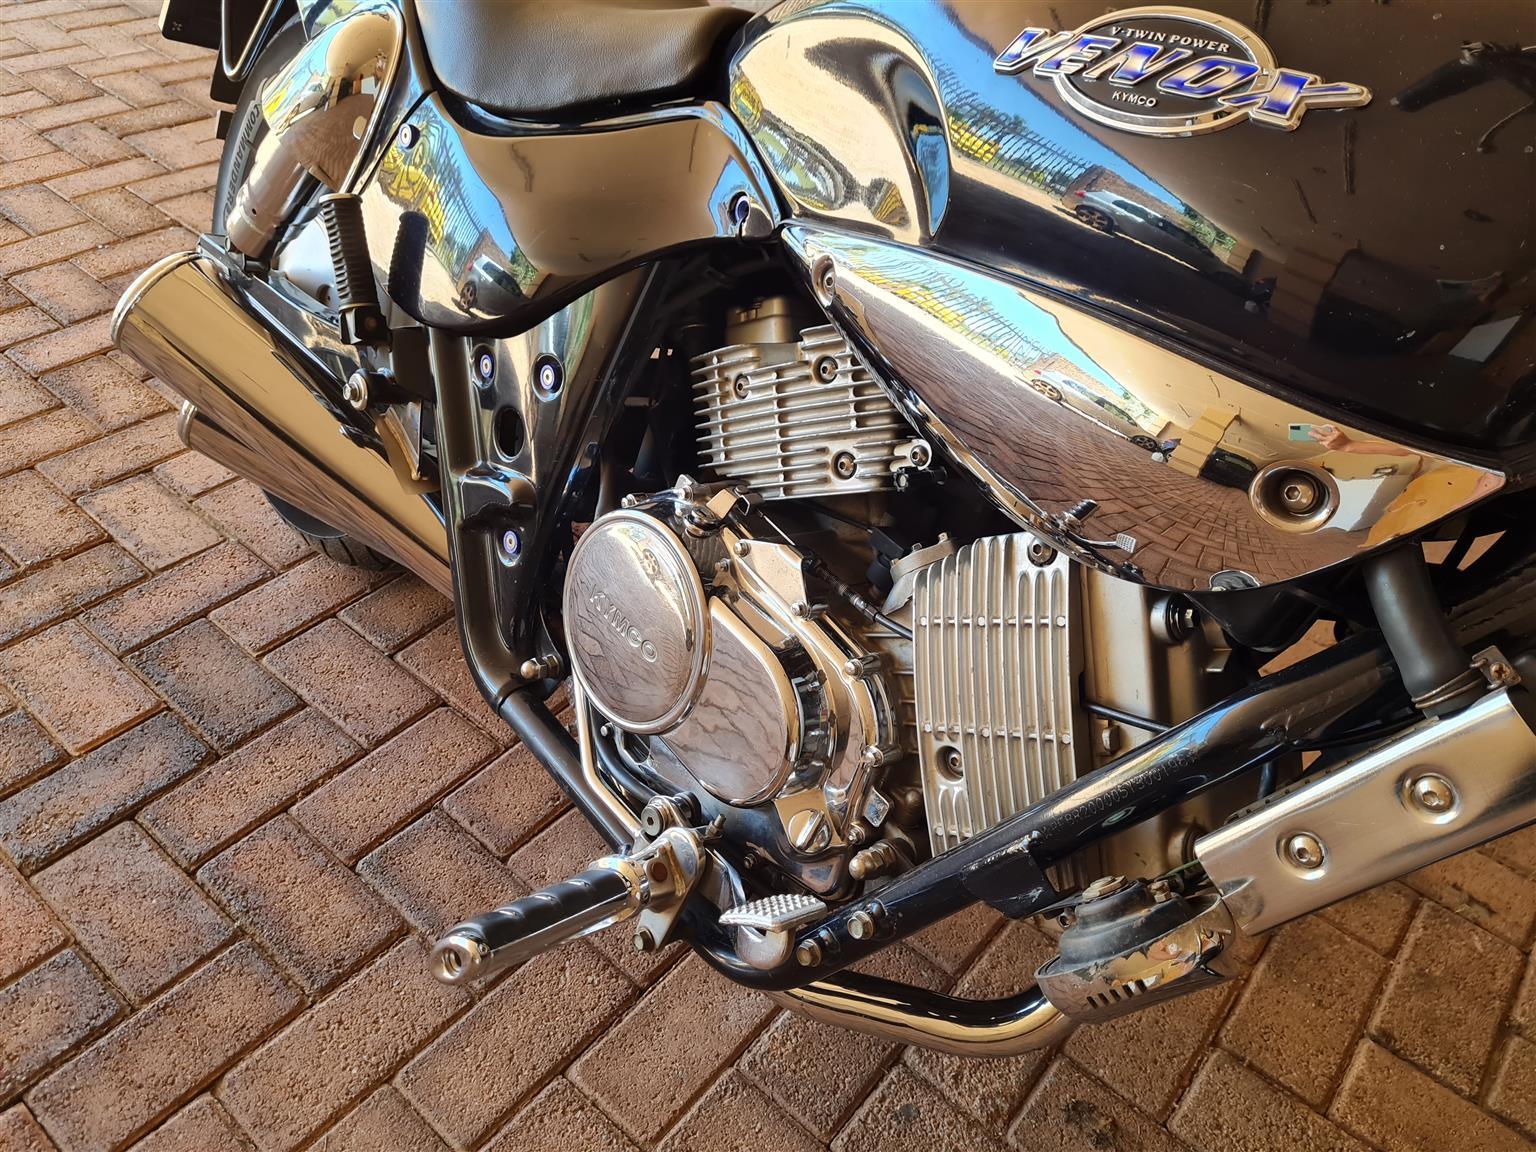 kymco venox 250cc